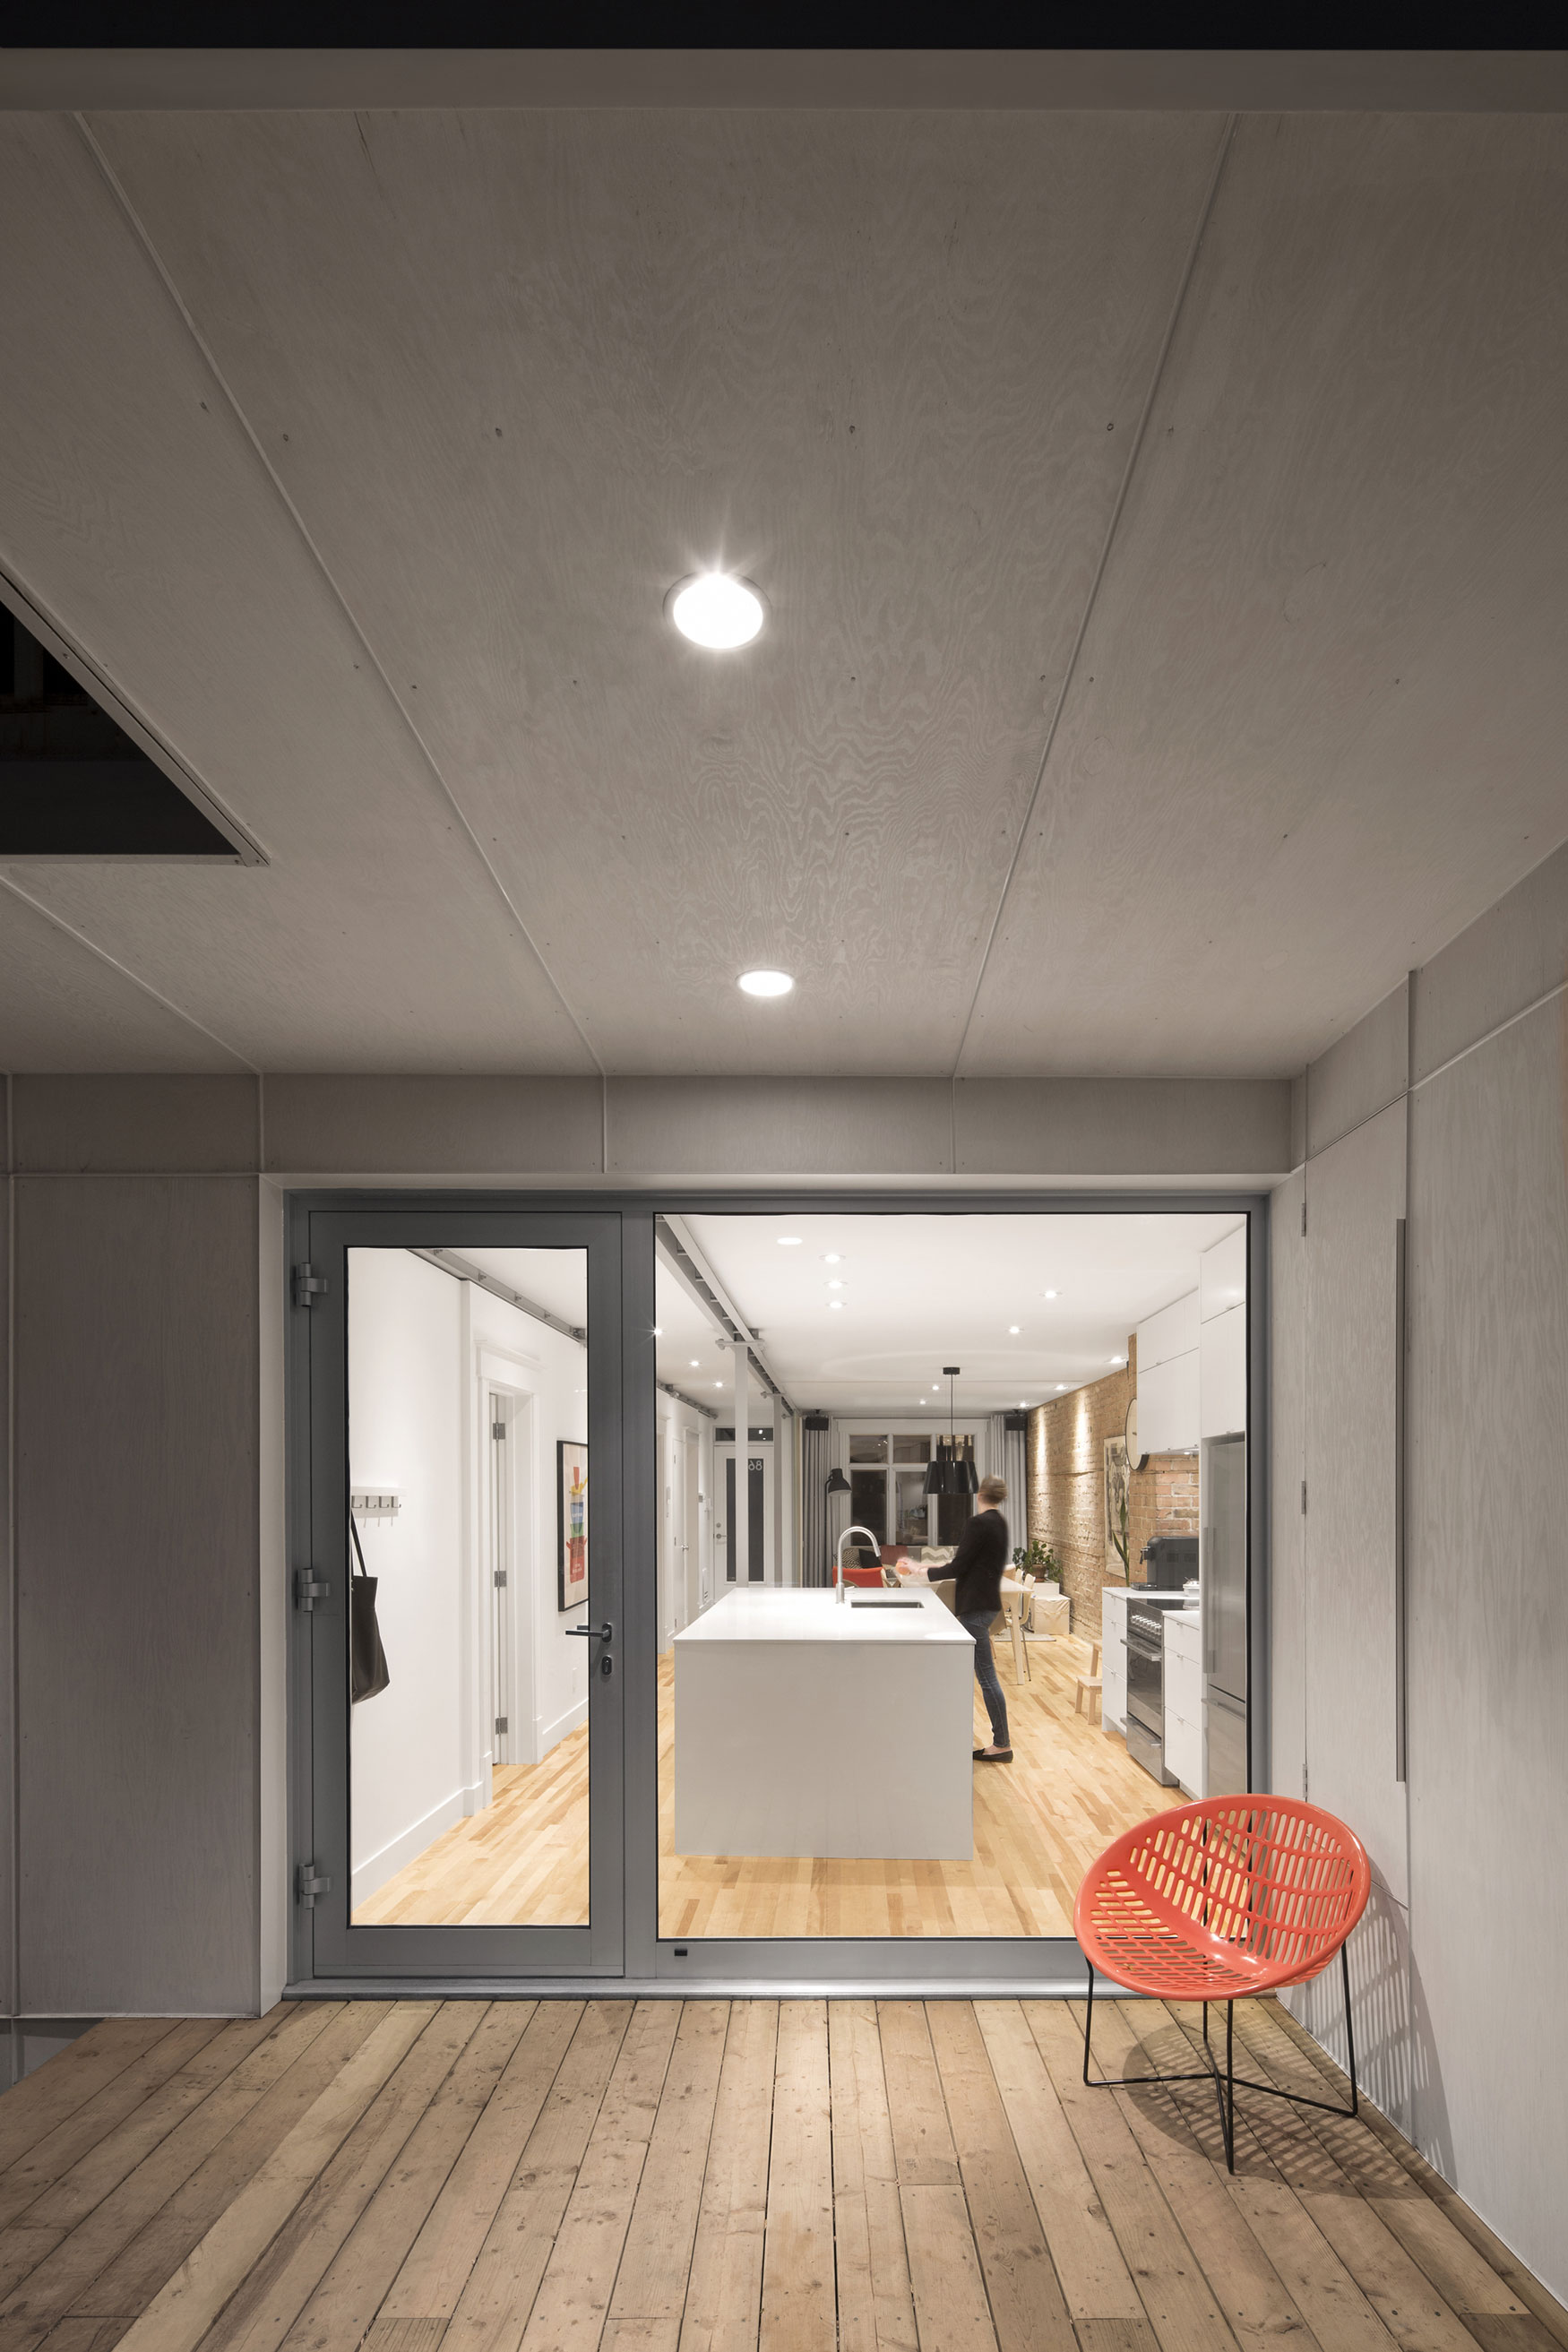 867 De Bougainville Apartment by Bourgeois:Lechasseur architects-11